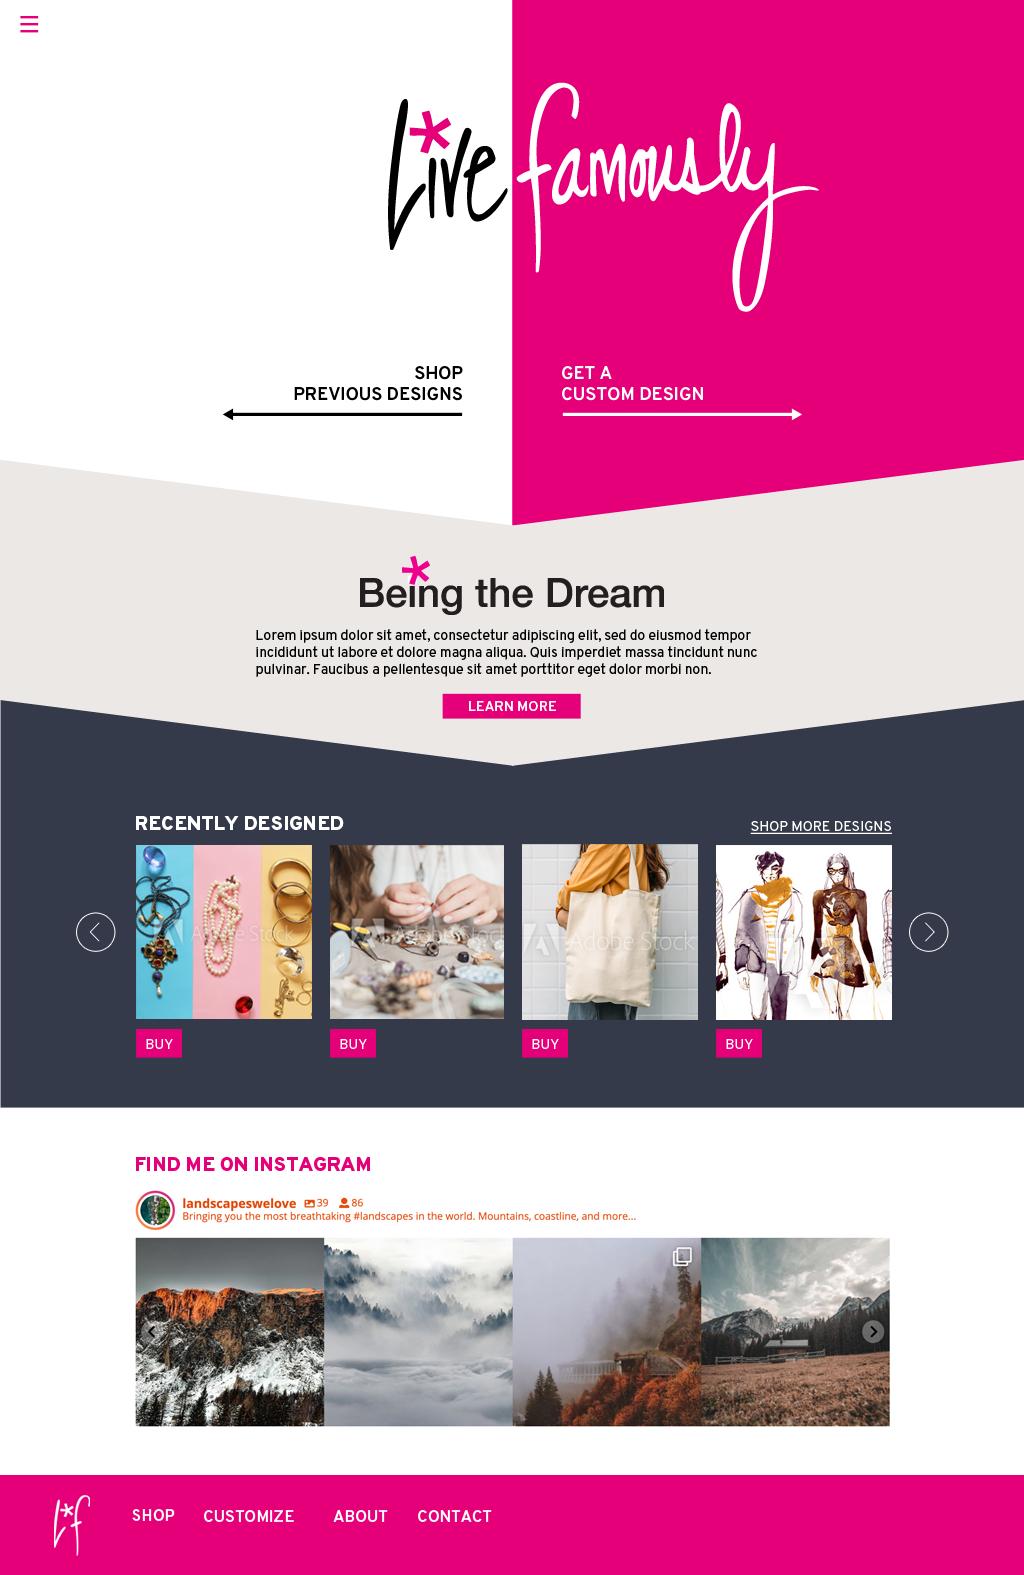 Pin By Ambreen Adnan On Web Designing In 2020 Web Design Custom Design Design